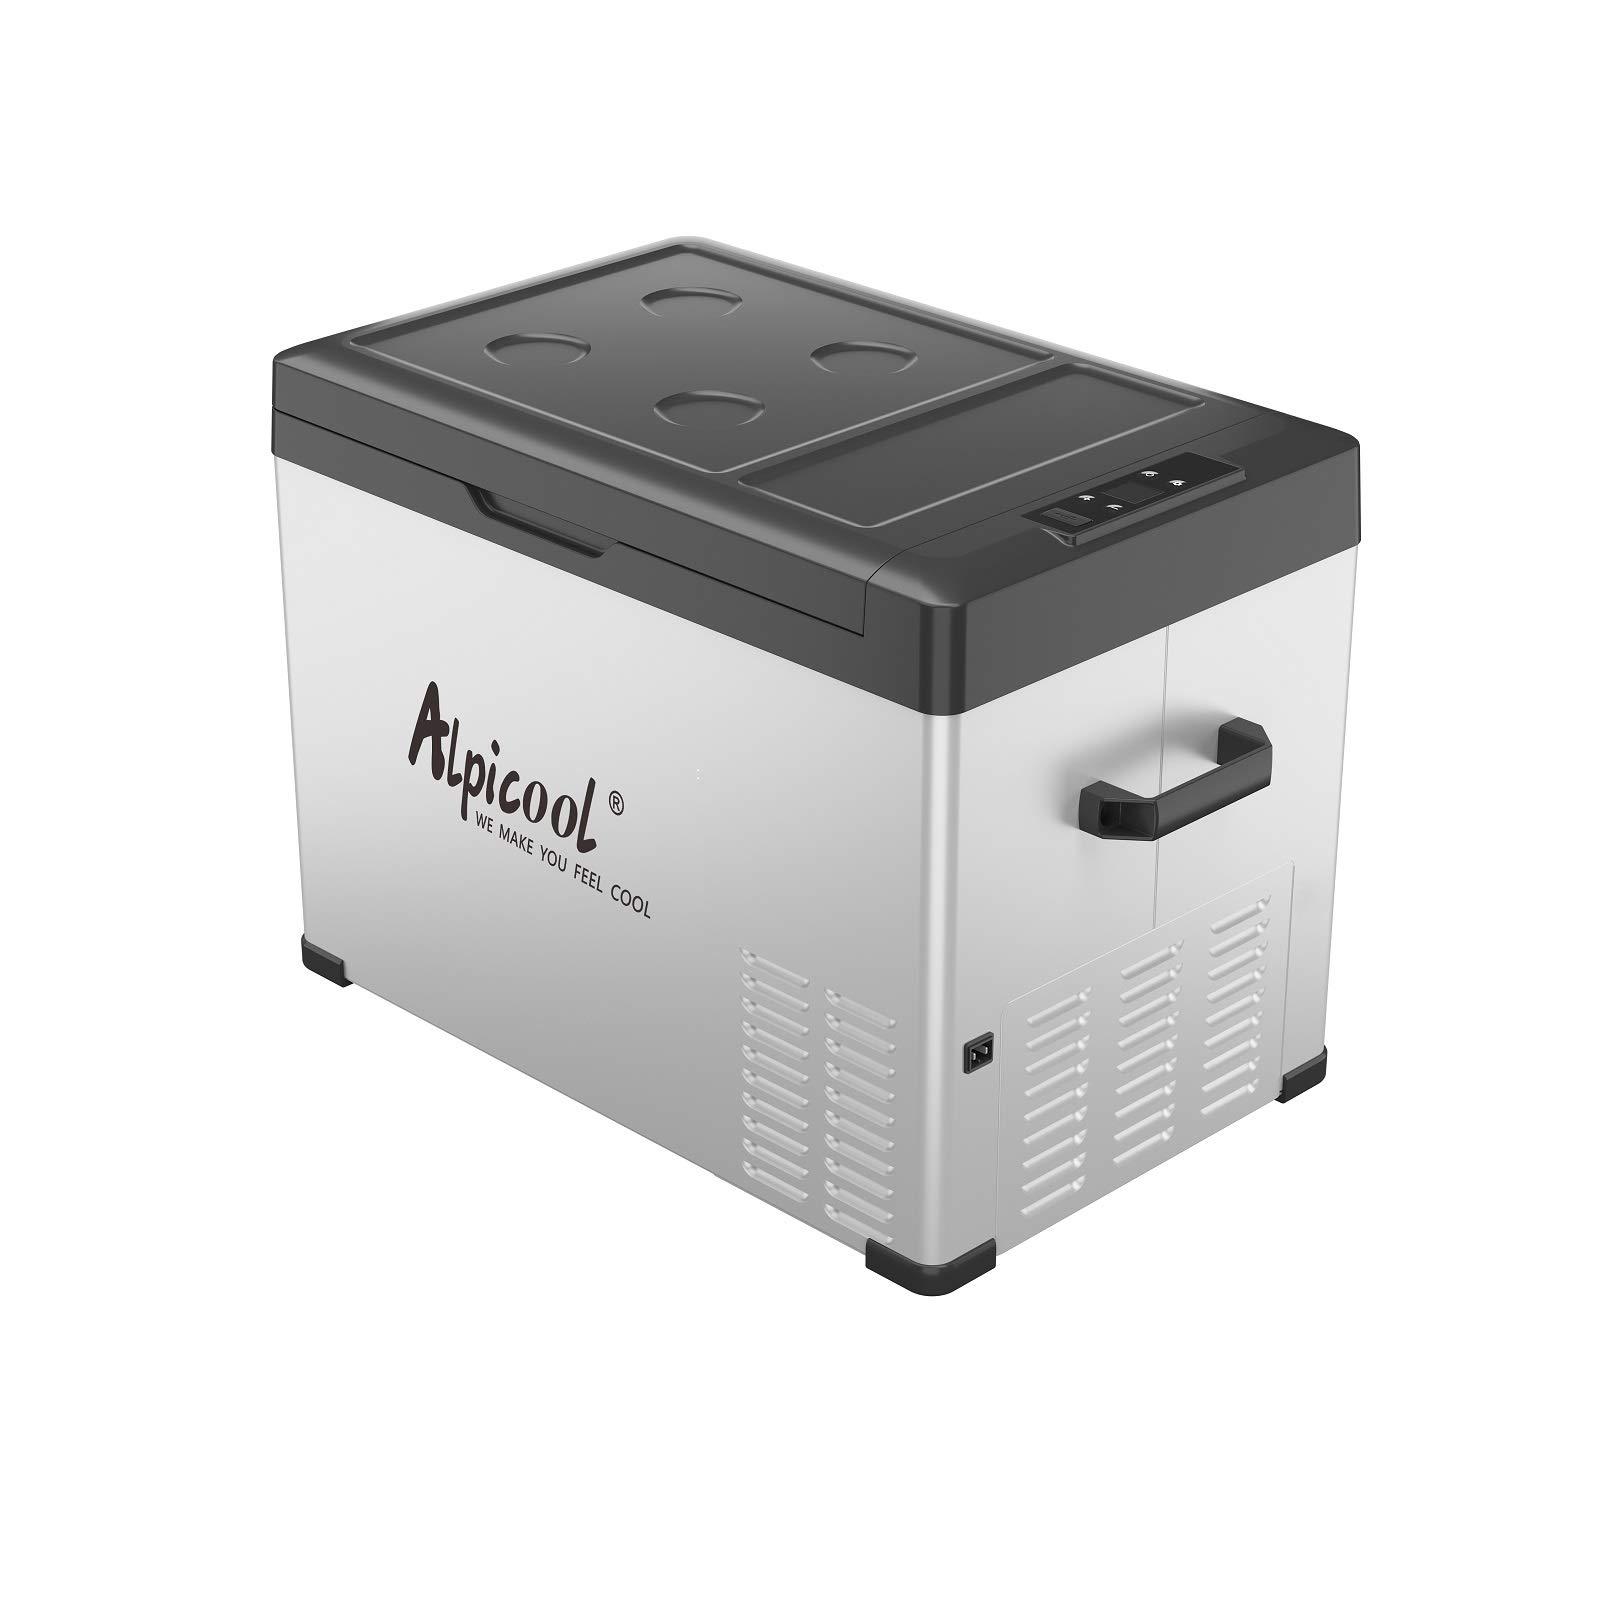 Support 12//24V DC and 100-240V AC Small Freezer Travel and Camping BODEGA APP Control Car Fridge 38 Quart(36L) Protable RV Refrigerator,-4℉-68℉ Electric Cooler Dual Zone